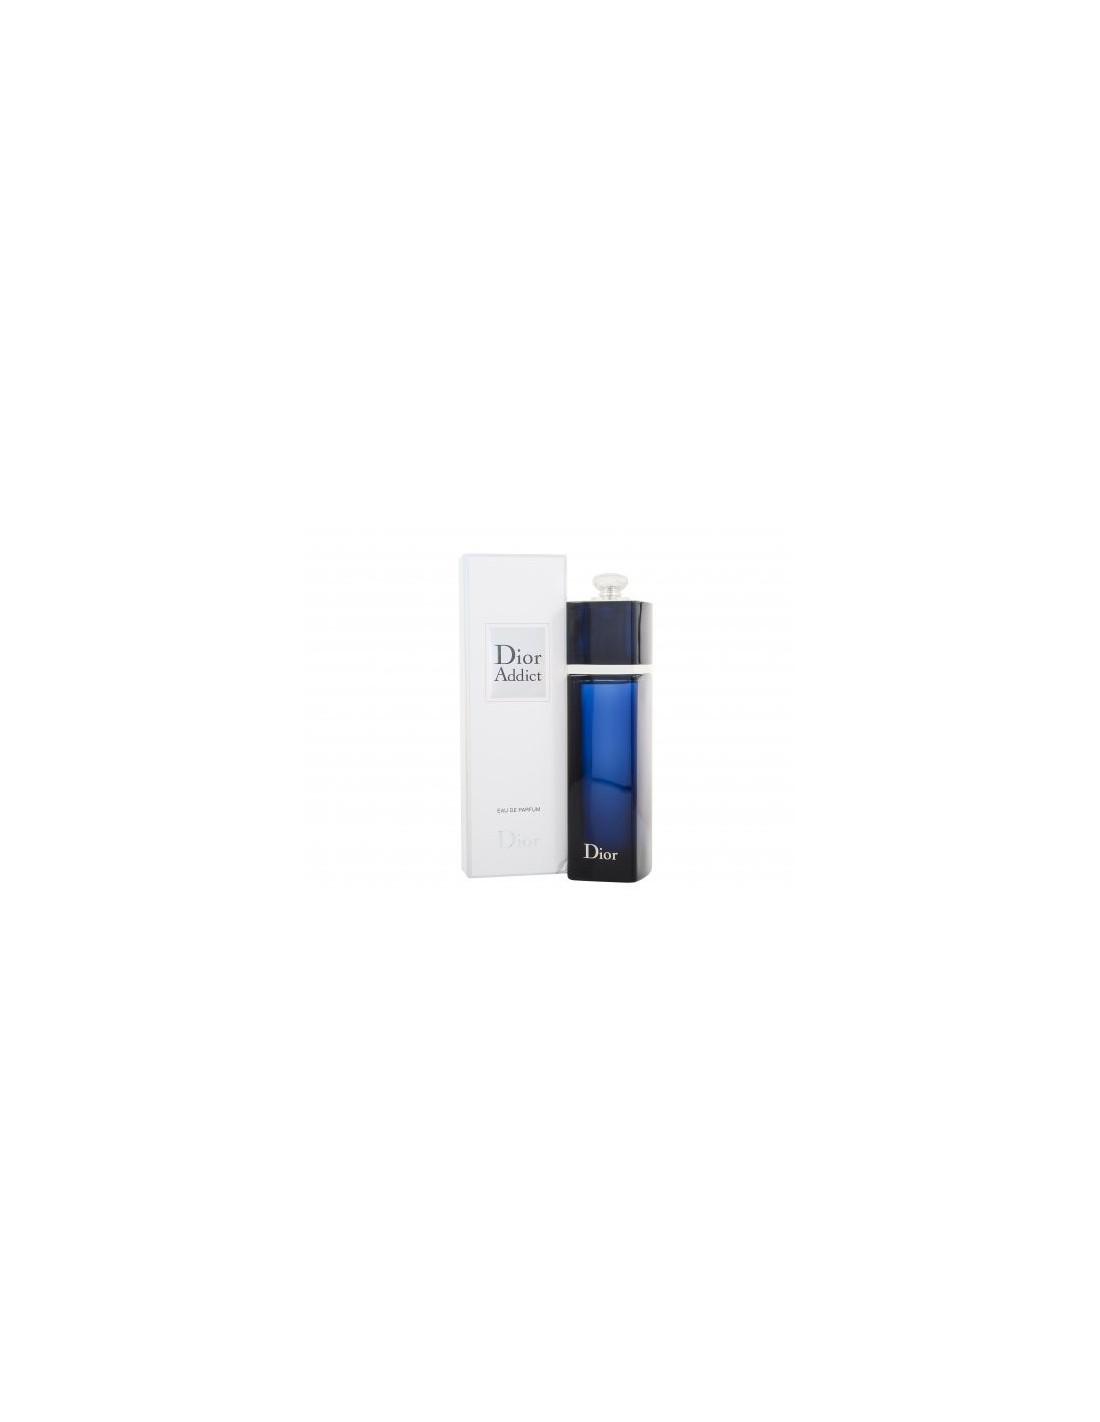 profumo donna christian dior addict eau de parfum. Black Bedroom Furniture Sets. Home Design Ideas